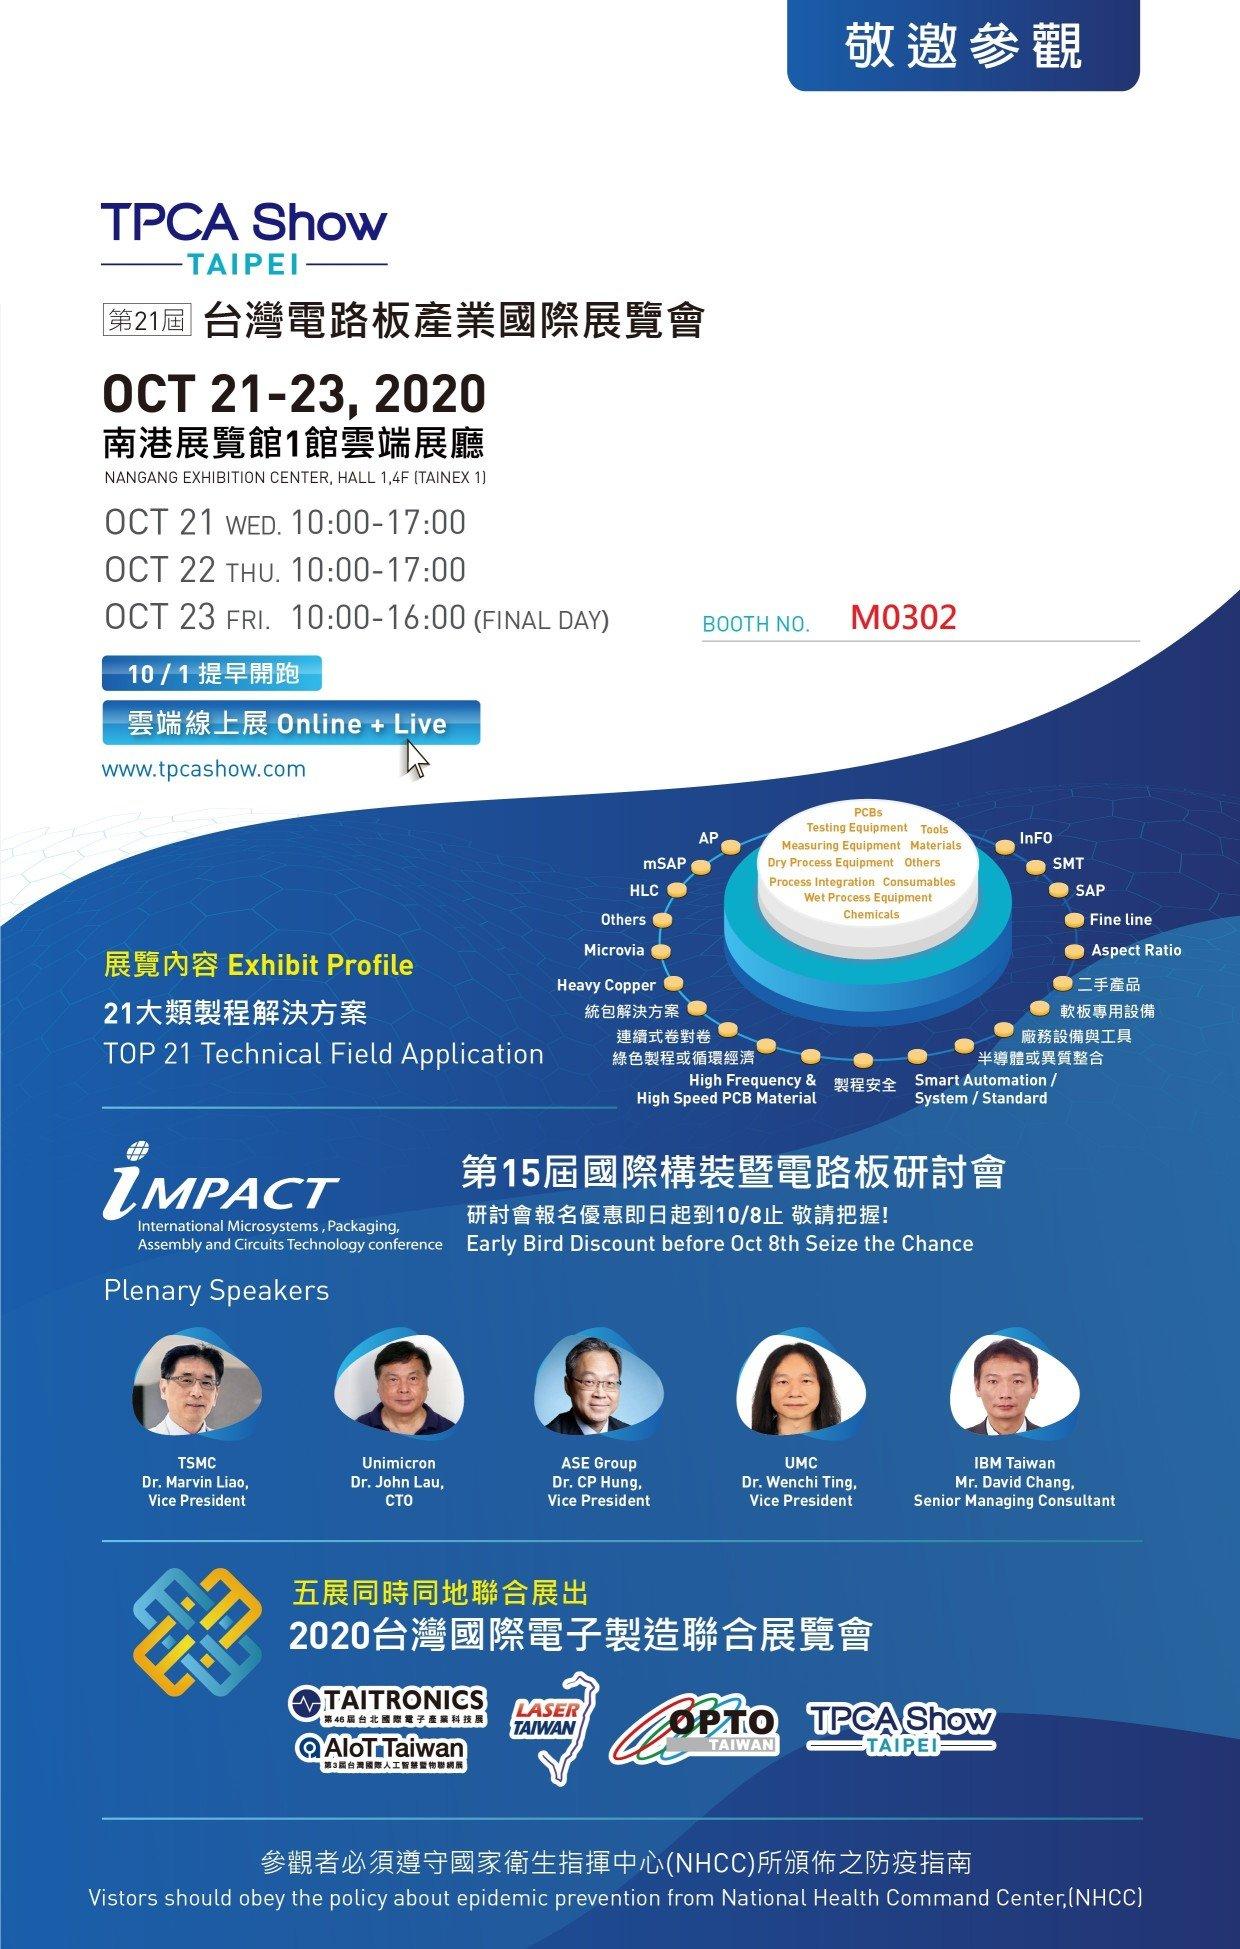 TPCA SHOW 2020年 電子邀請函(中文版)_正岡科技M0302